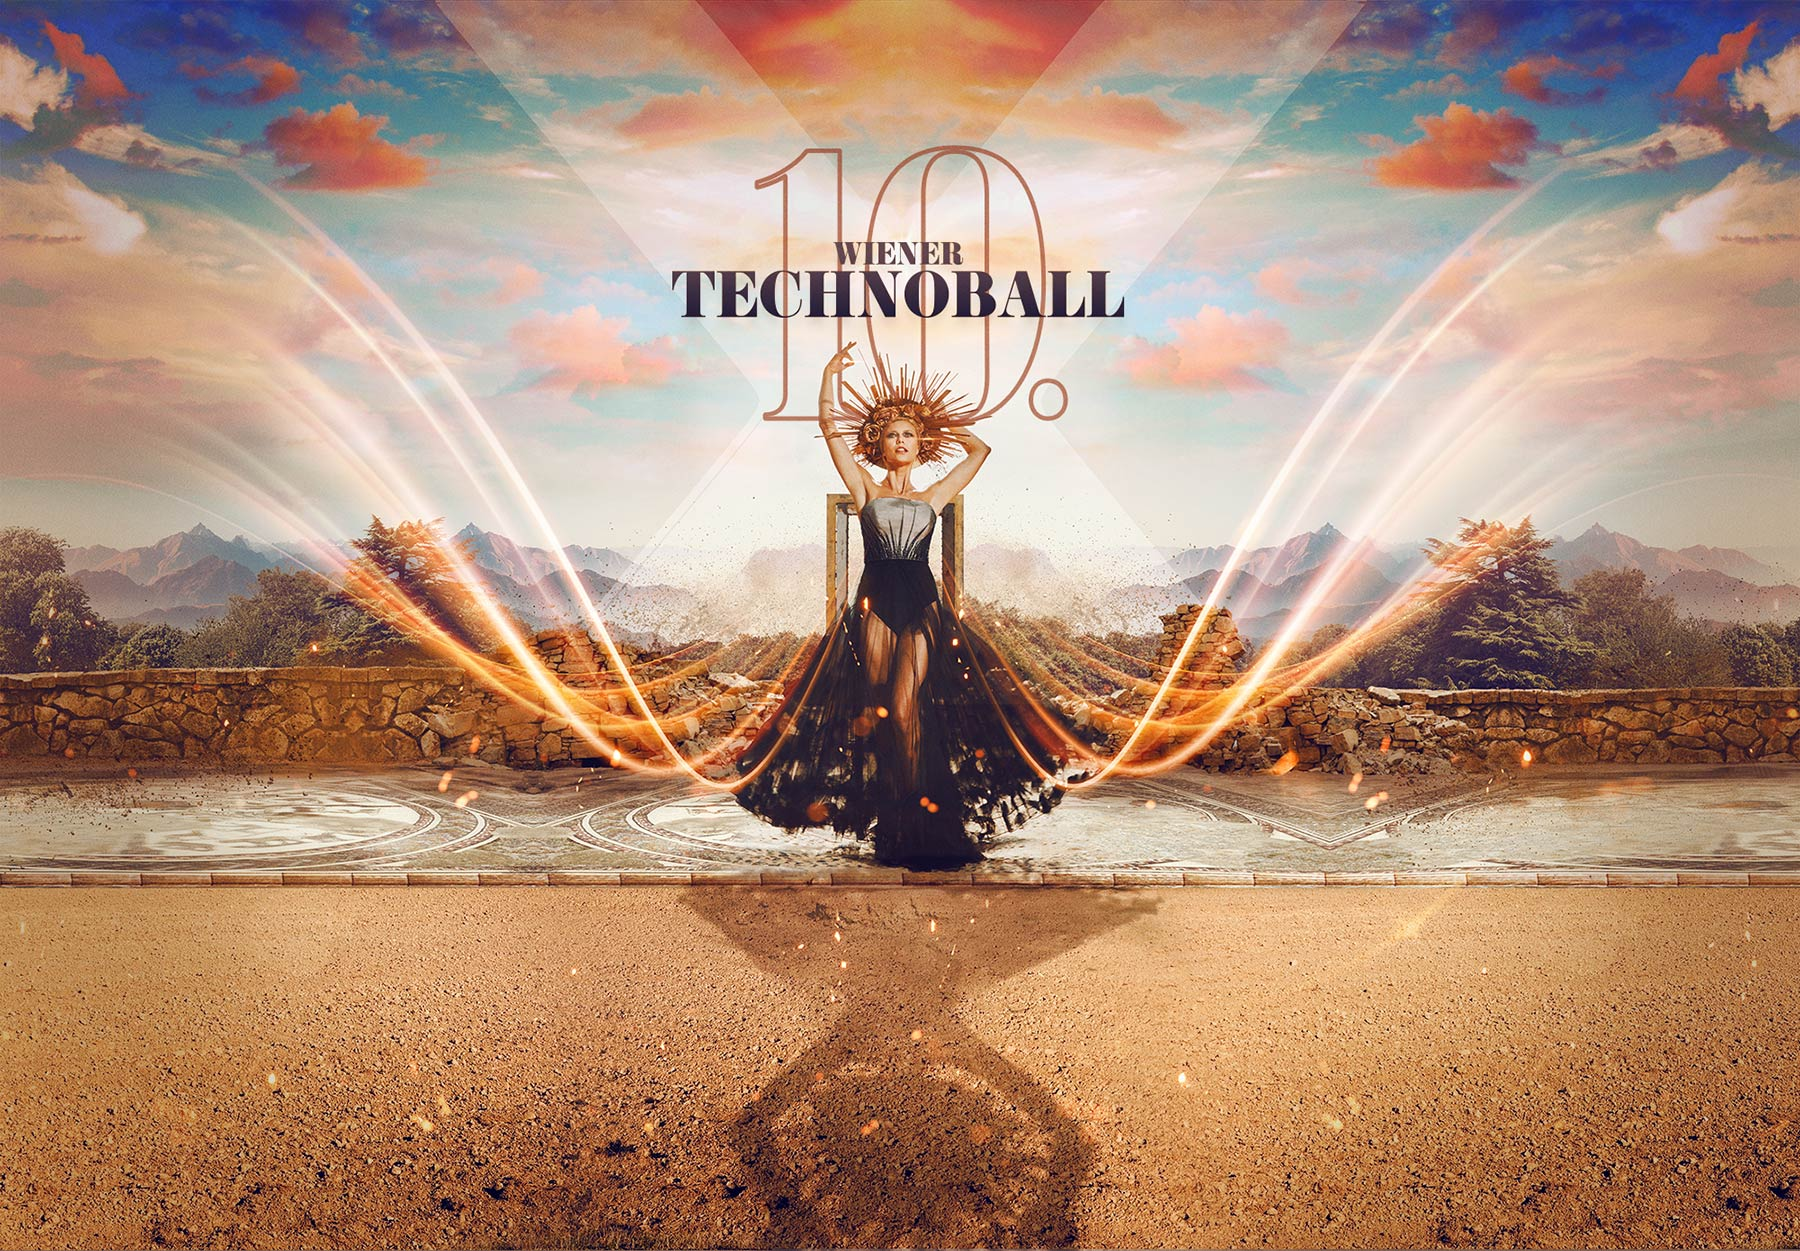 10. Wiener Technoball